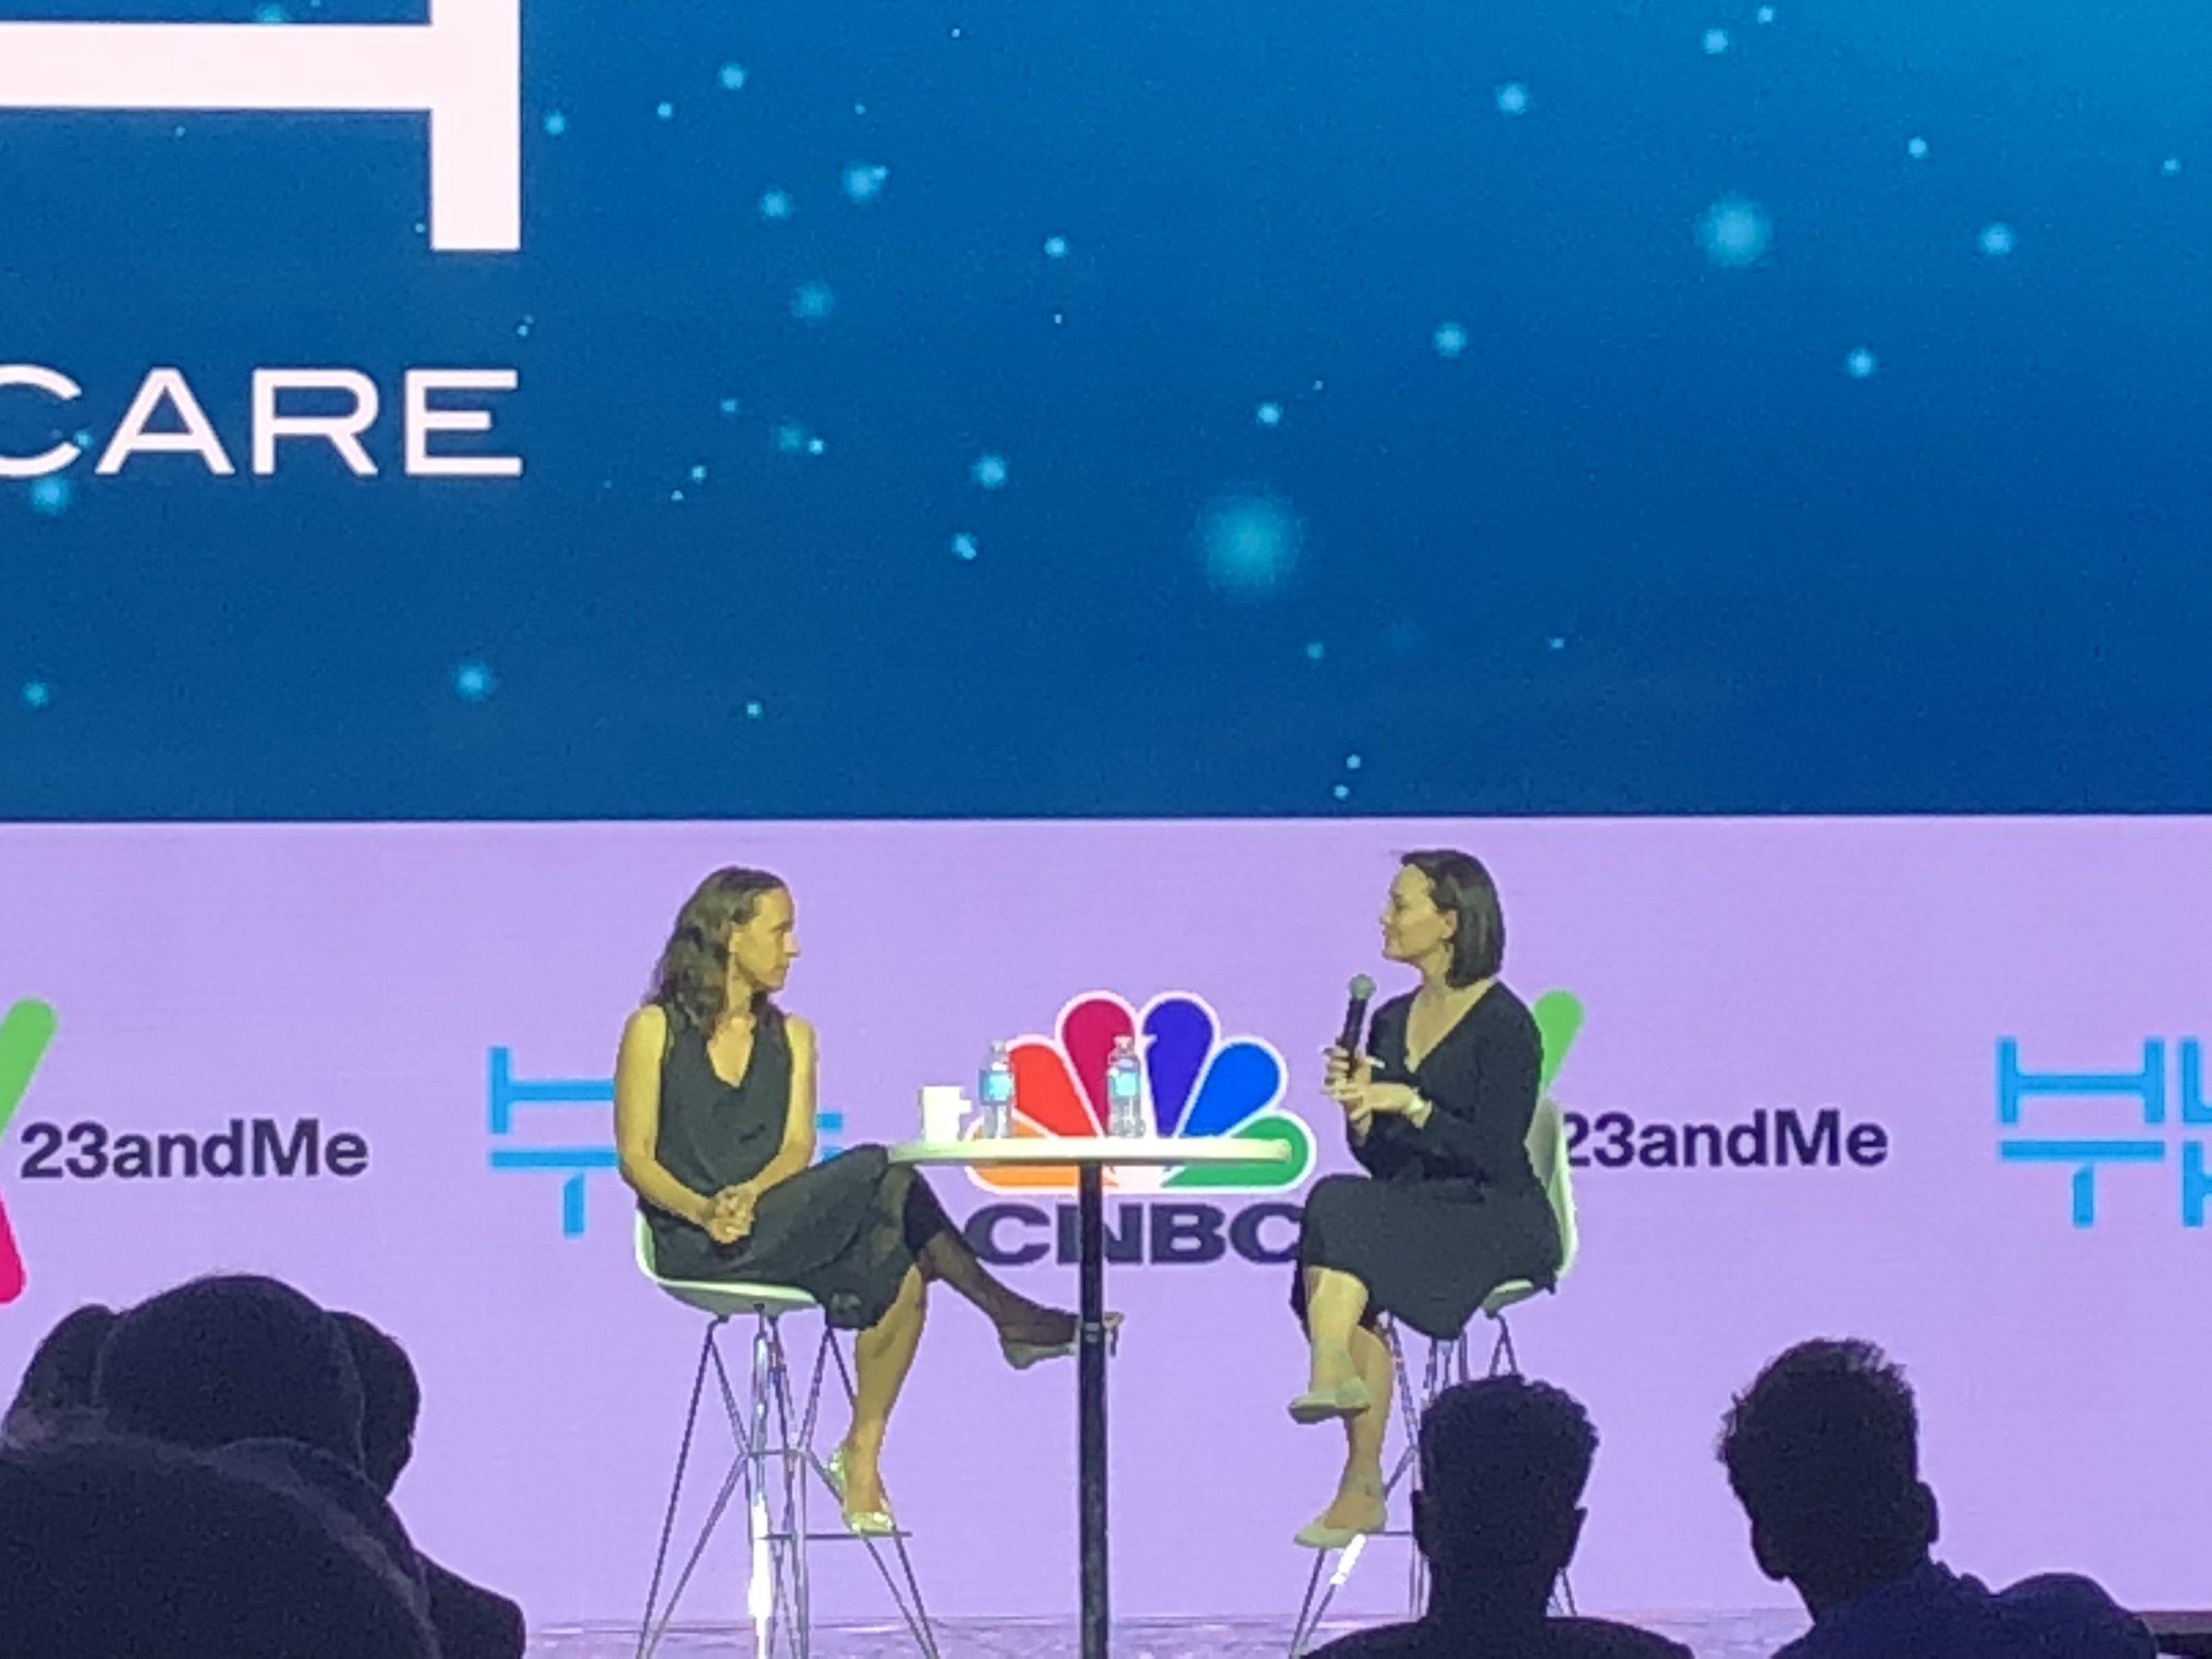 Meg Tirrell  (CNBC) interviews  anne WOJCIcki  (Co-Founder/CEO, 23andme)